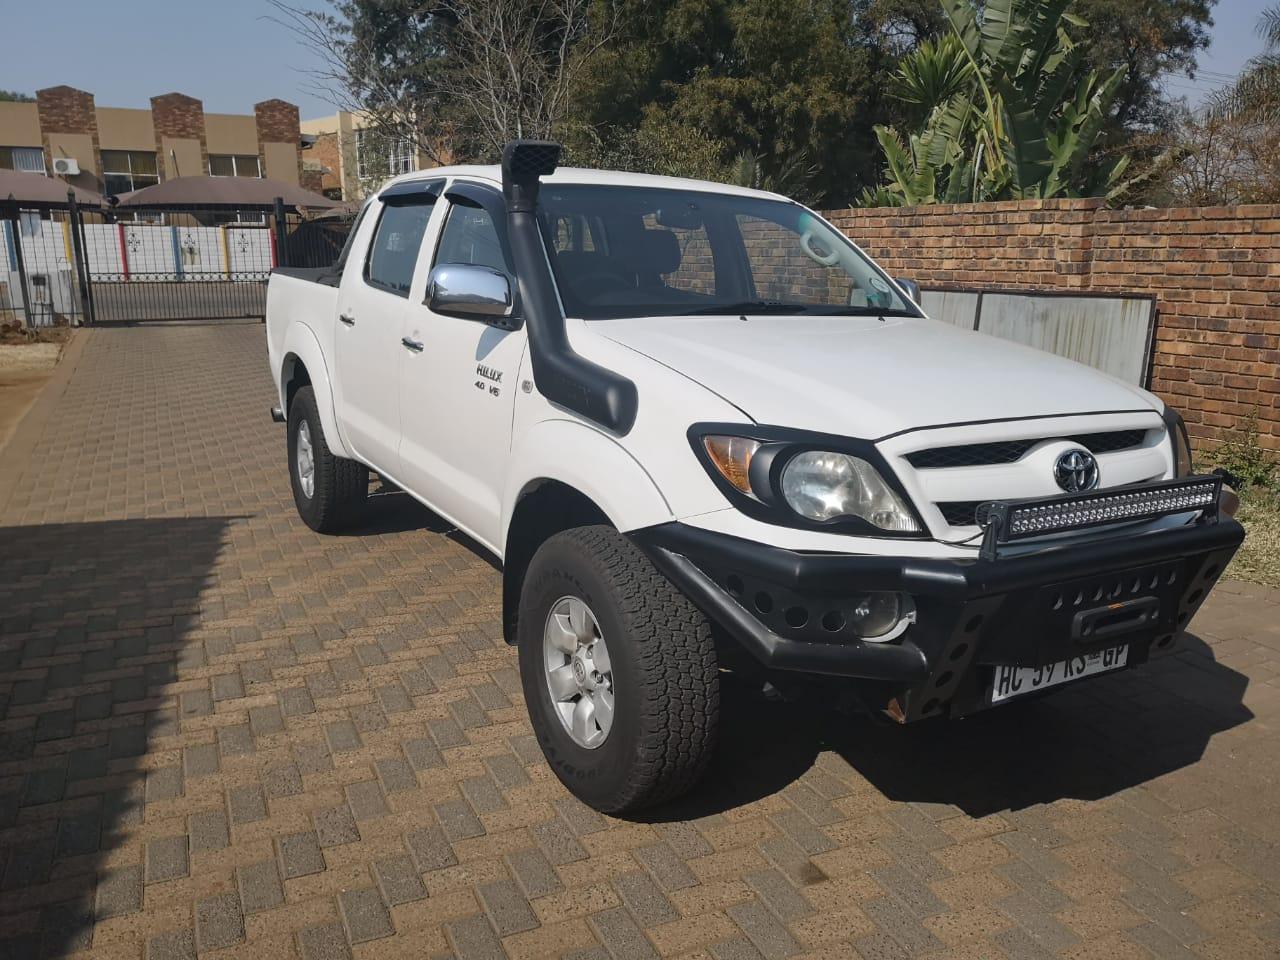 2007 Toyota Hilux V6 4.0 double cab 4x4 Raider automatic